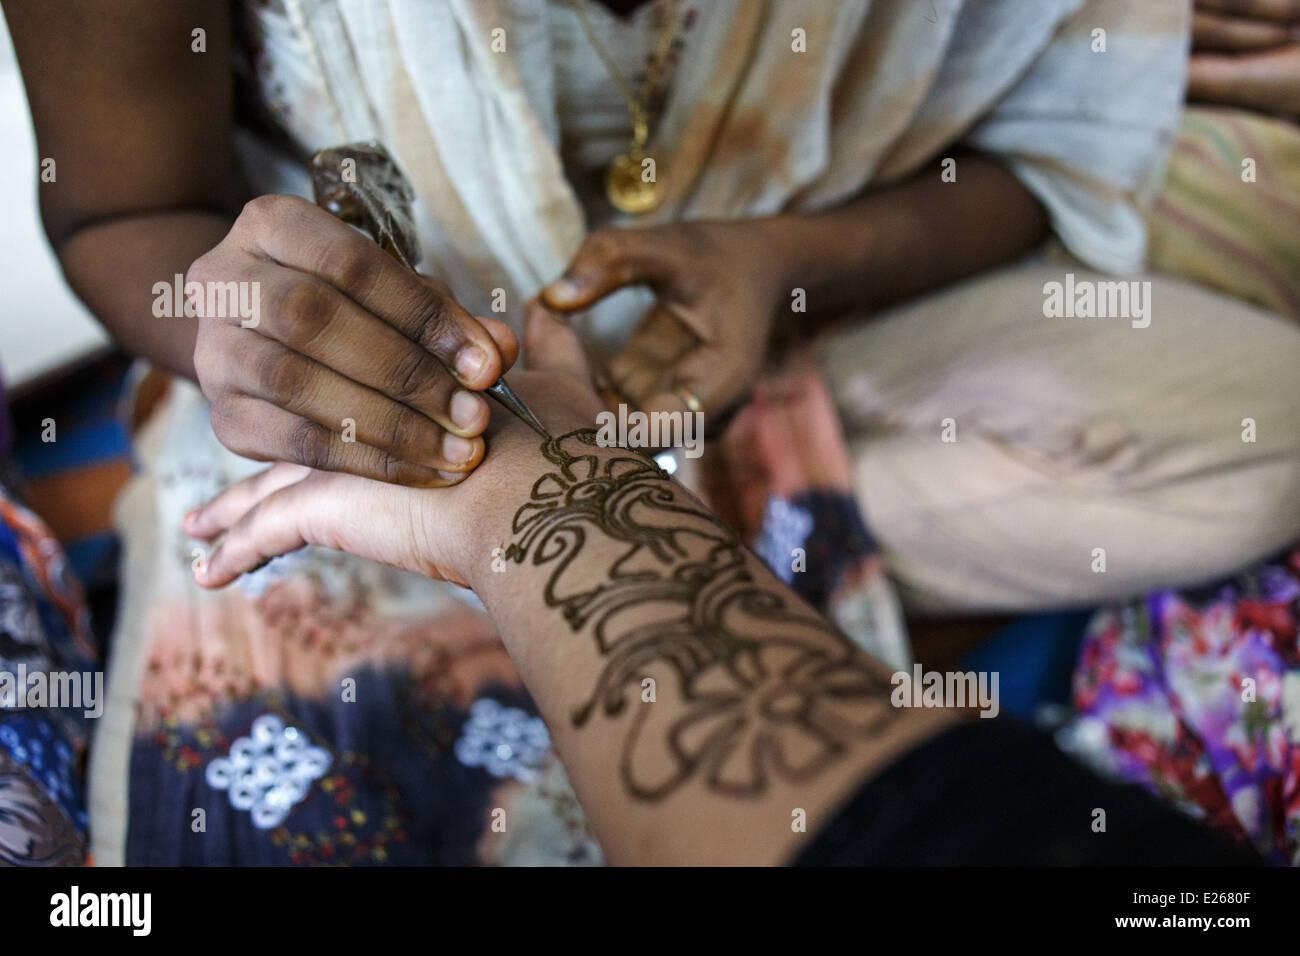 A mehndi (heena, henna) hand decoration in Kandivali area of Mumbai, India. - Stock Image